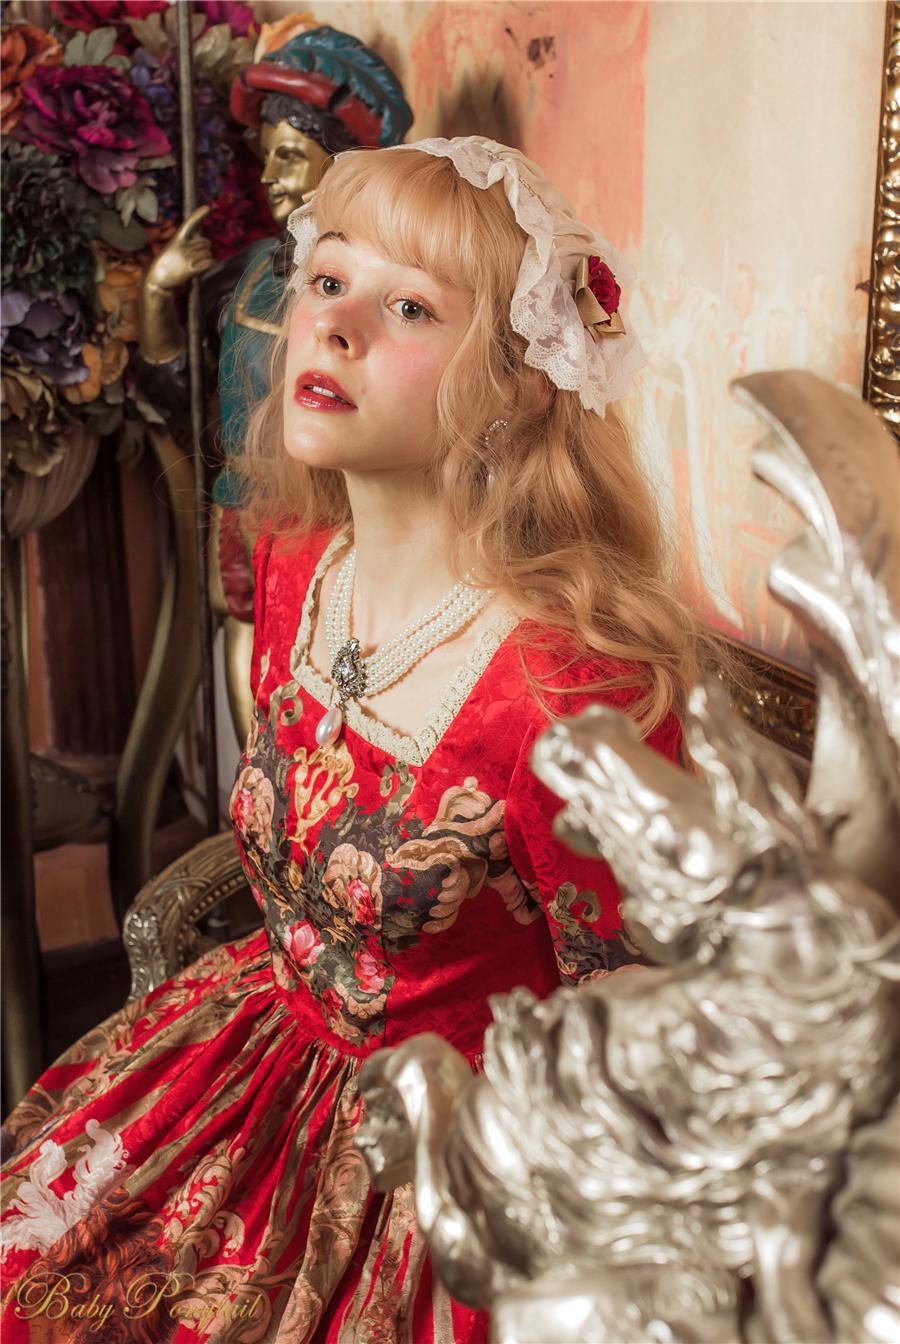 BabyPonytail_Rose Battle_Model Photo_OP Red studio_Claudia_24.jpg